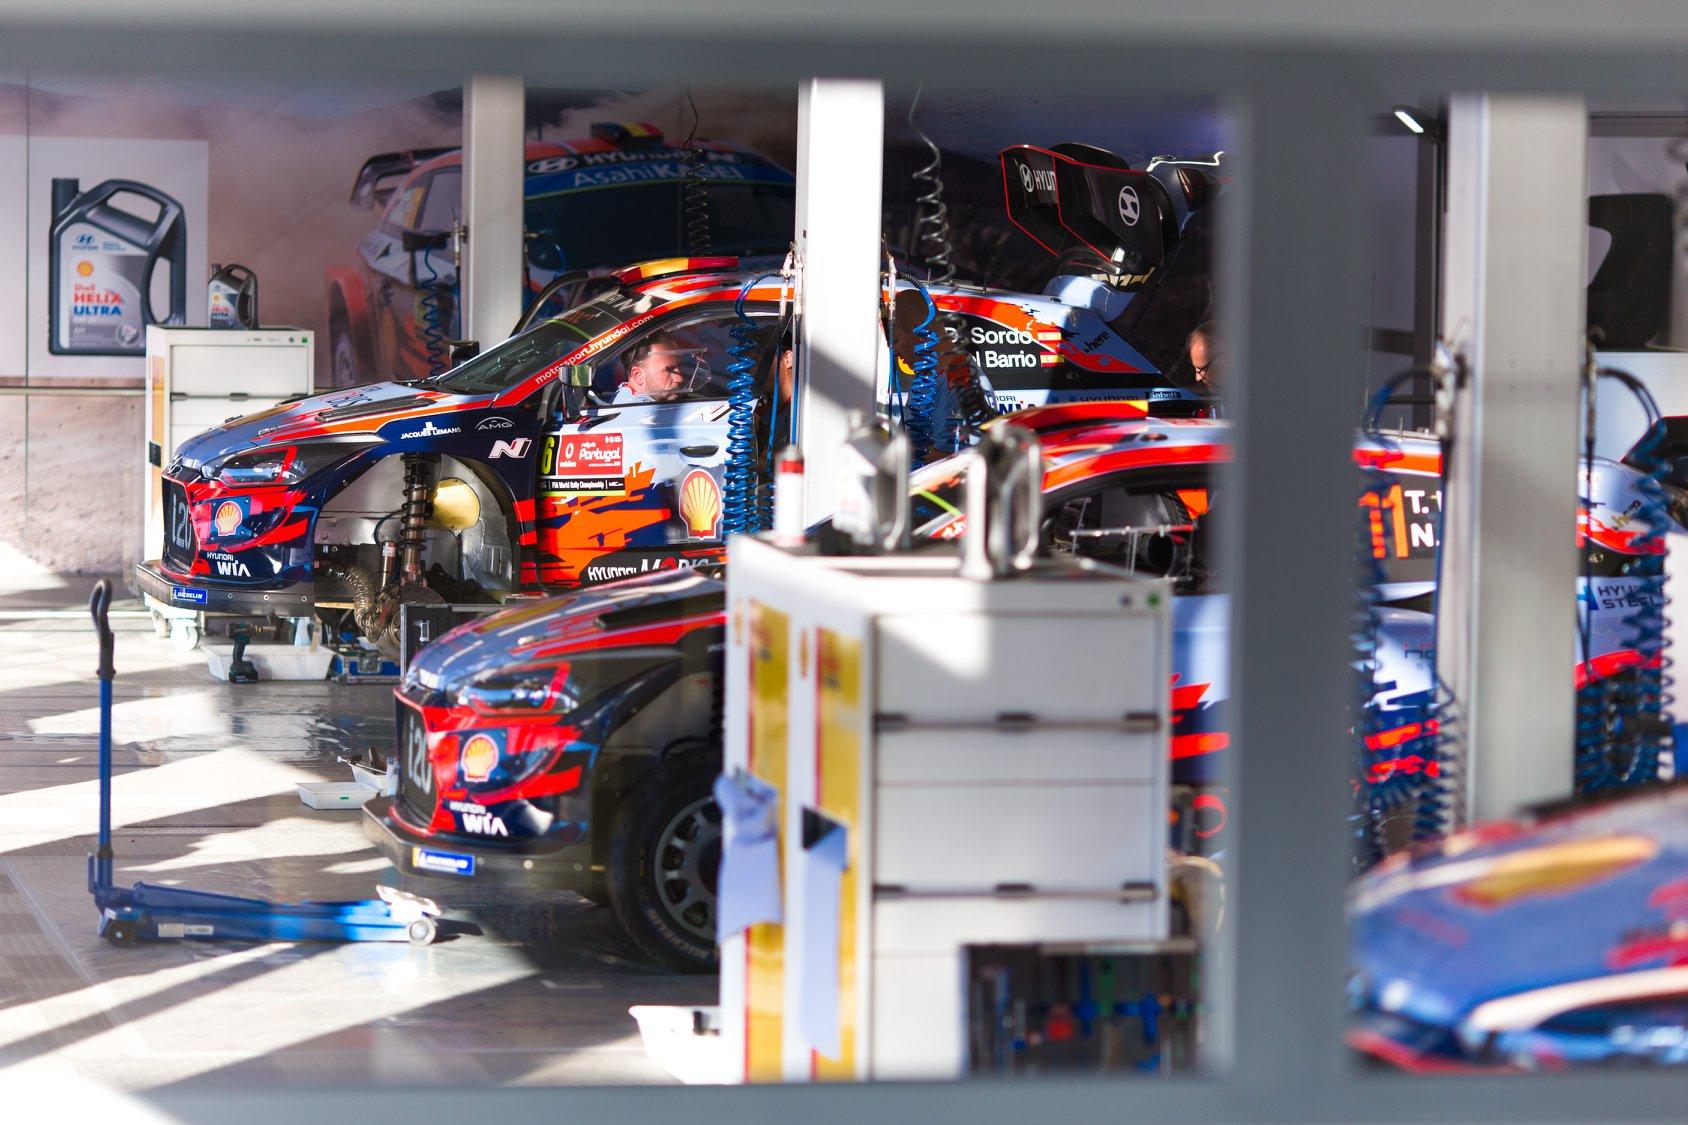 źródło: fb/Hyundai Motorsport